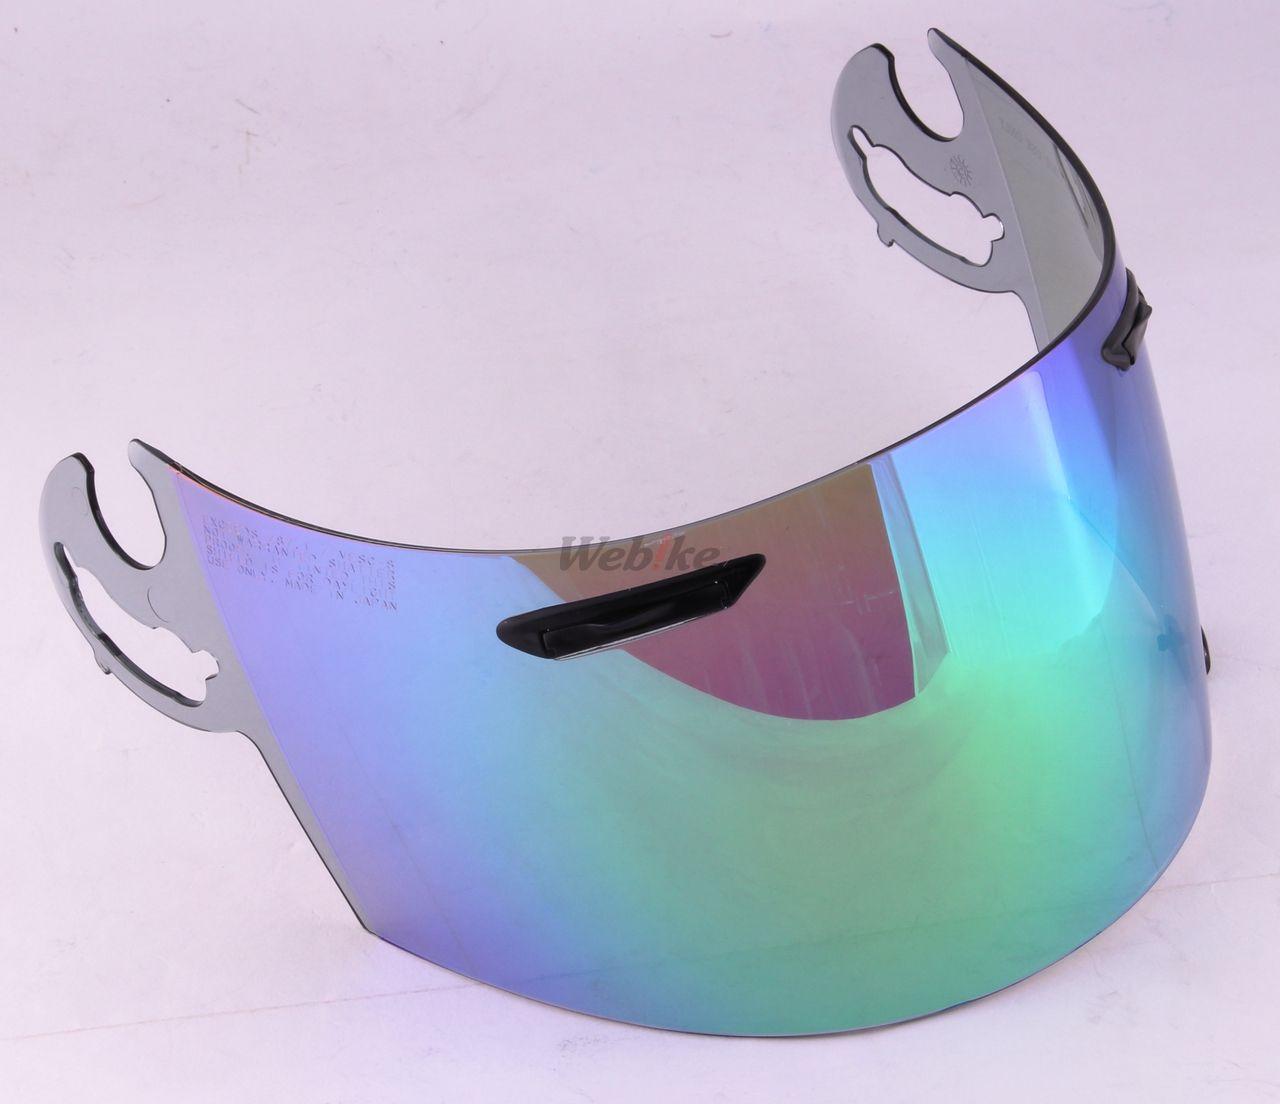 【Arai】Super adsis I安全帽鏡面鏡片 - 「Webike-摩托百貨」